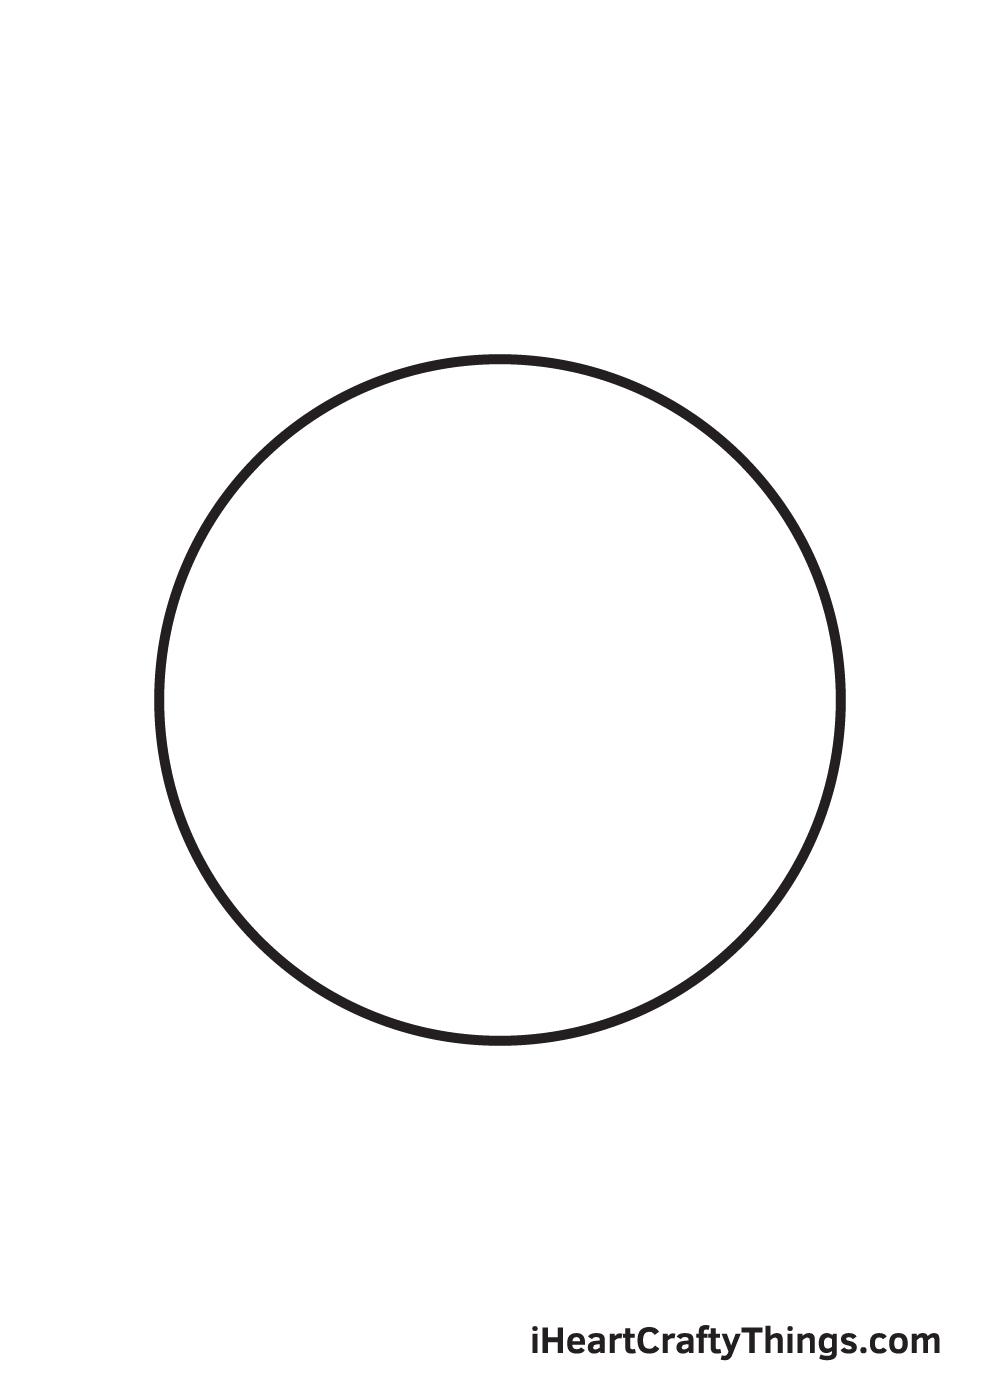 Emojis Drawing – Step 1